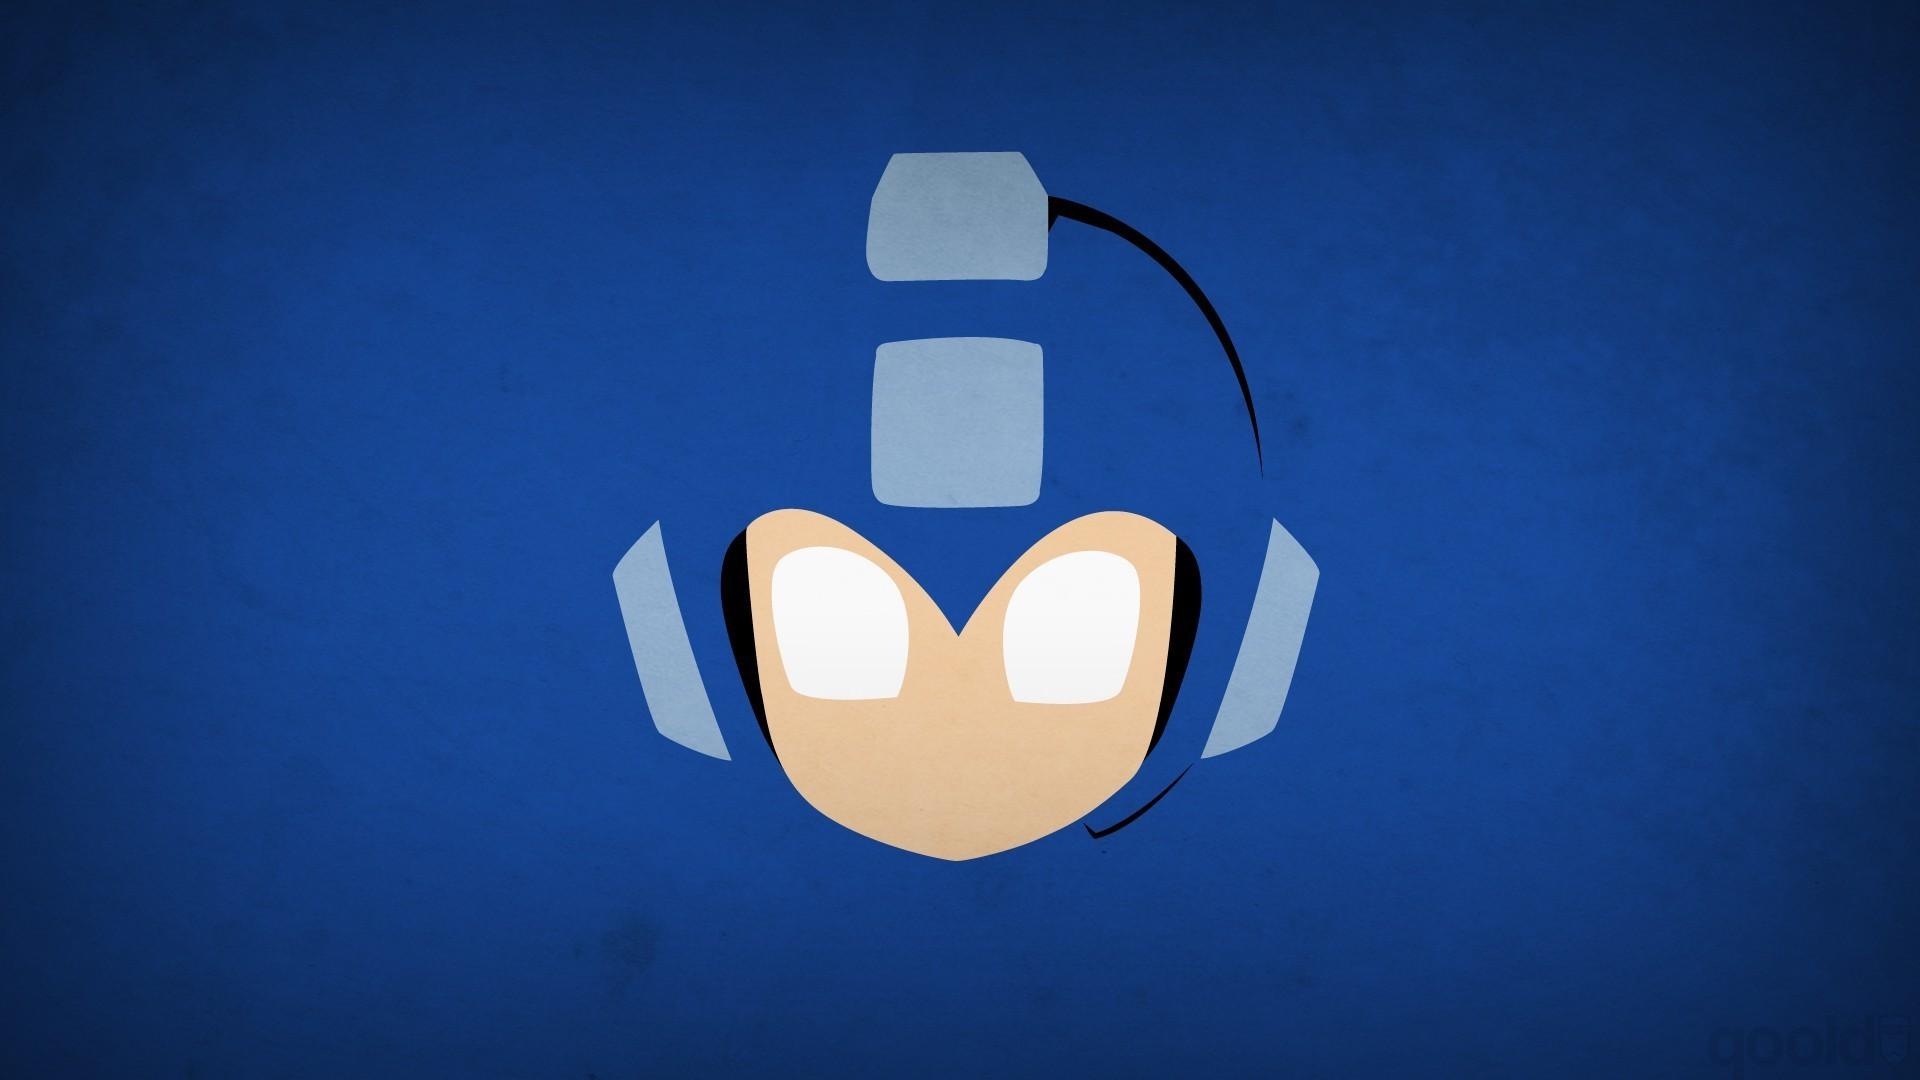 minimalism, Simple Background, Video Games, Mega Man